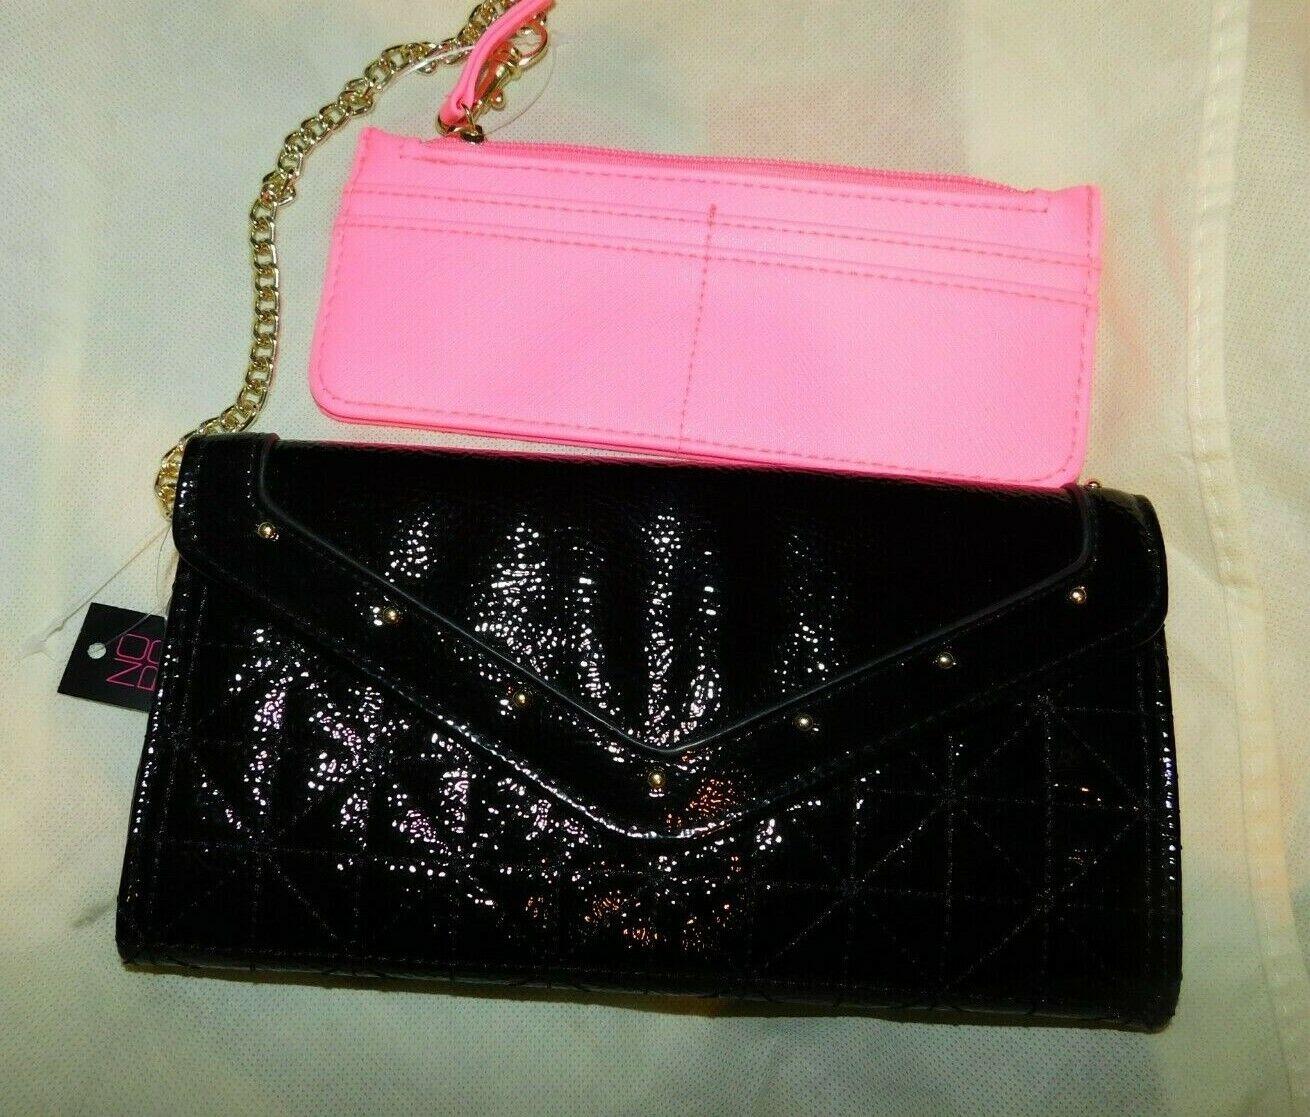 NEW Black & Hot Pink Wallet by No Boundaries